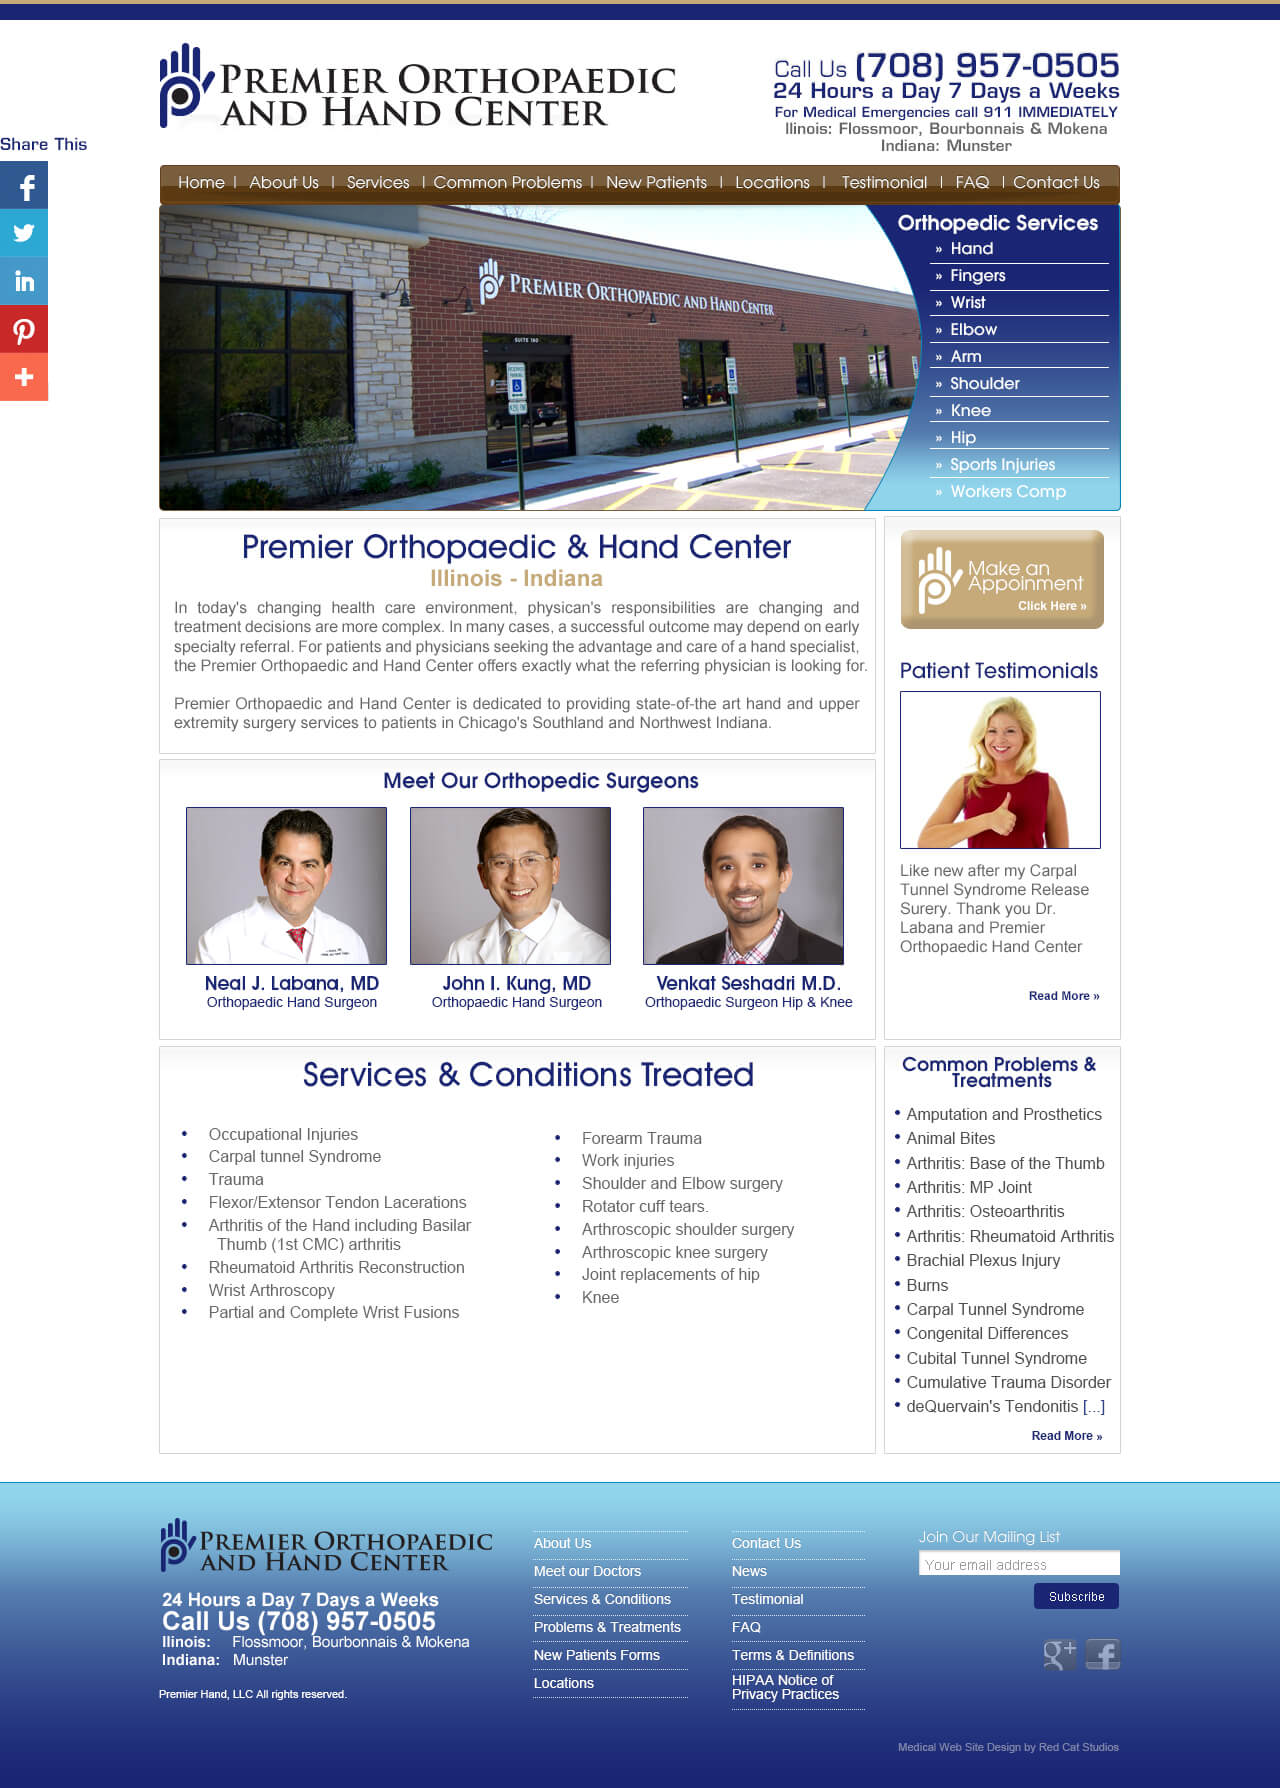 Medical-web-design-WordPress-website